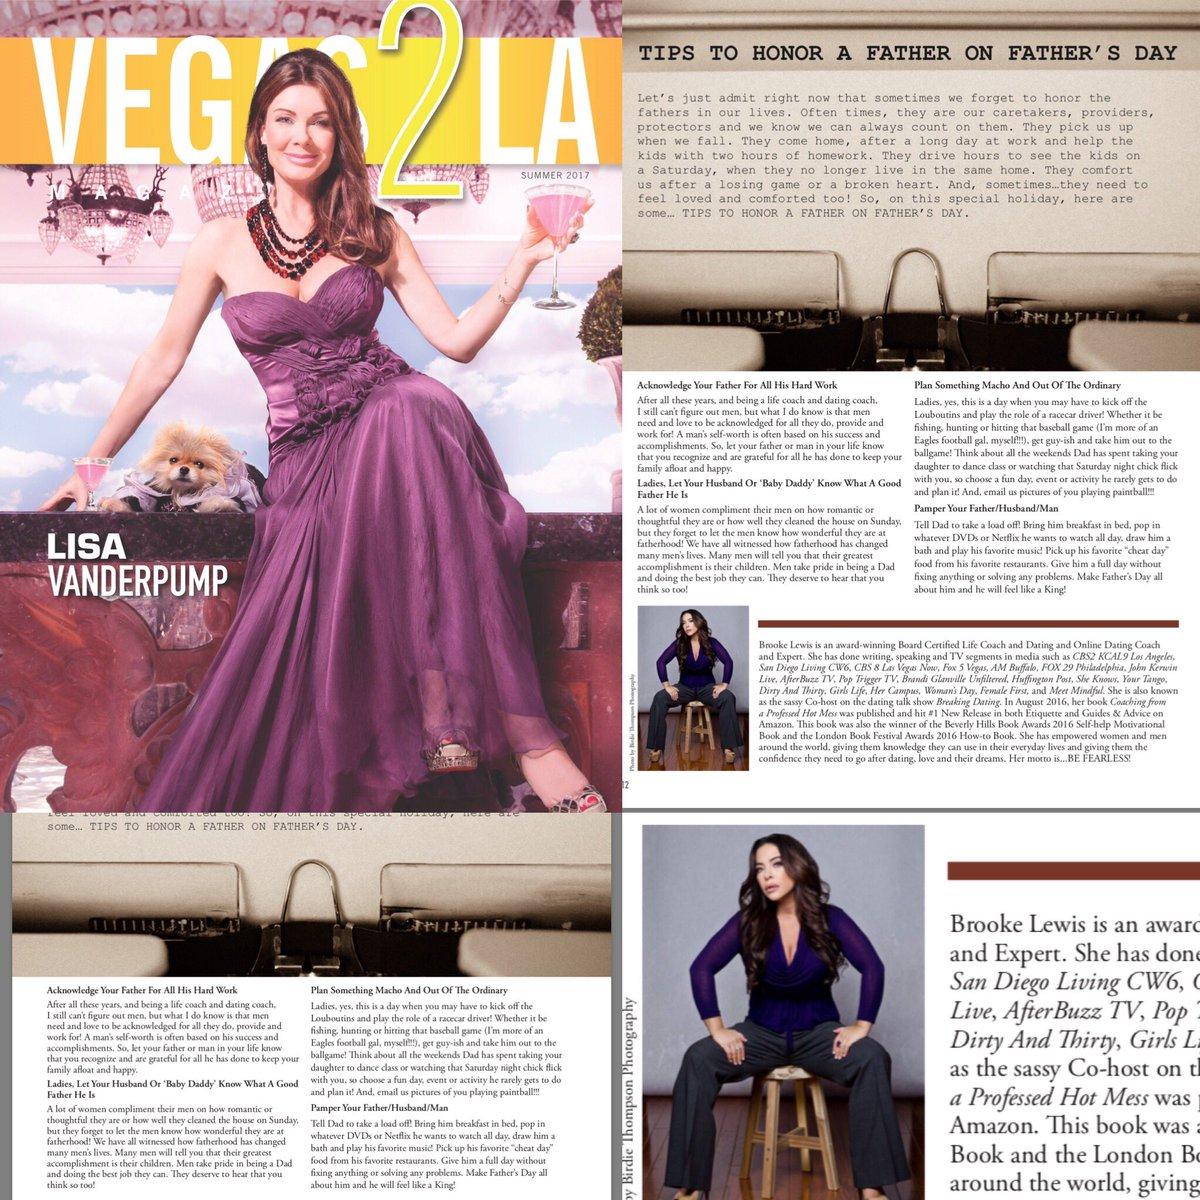 .@Vegas2LAMag @BCLONA @AlanSemsar #HappyFathersDay #article @LisaVanderpump #beauty graces COVER #FathersDay  to all! #expert #Vegas<br>http://pic.twitter.com/QVK2Yr52yc